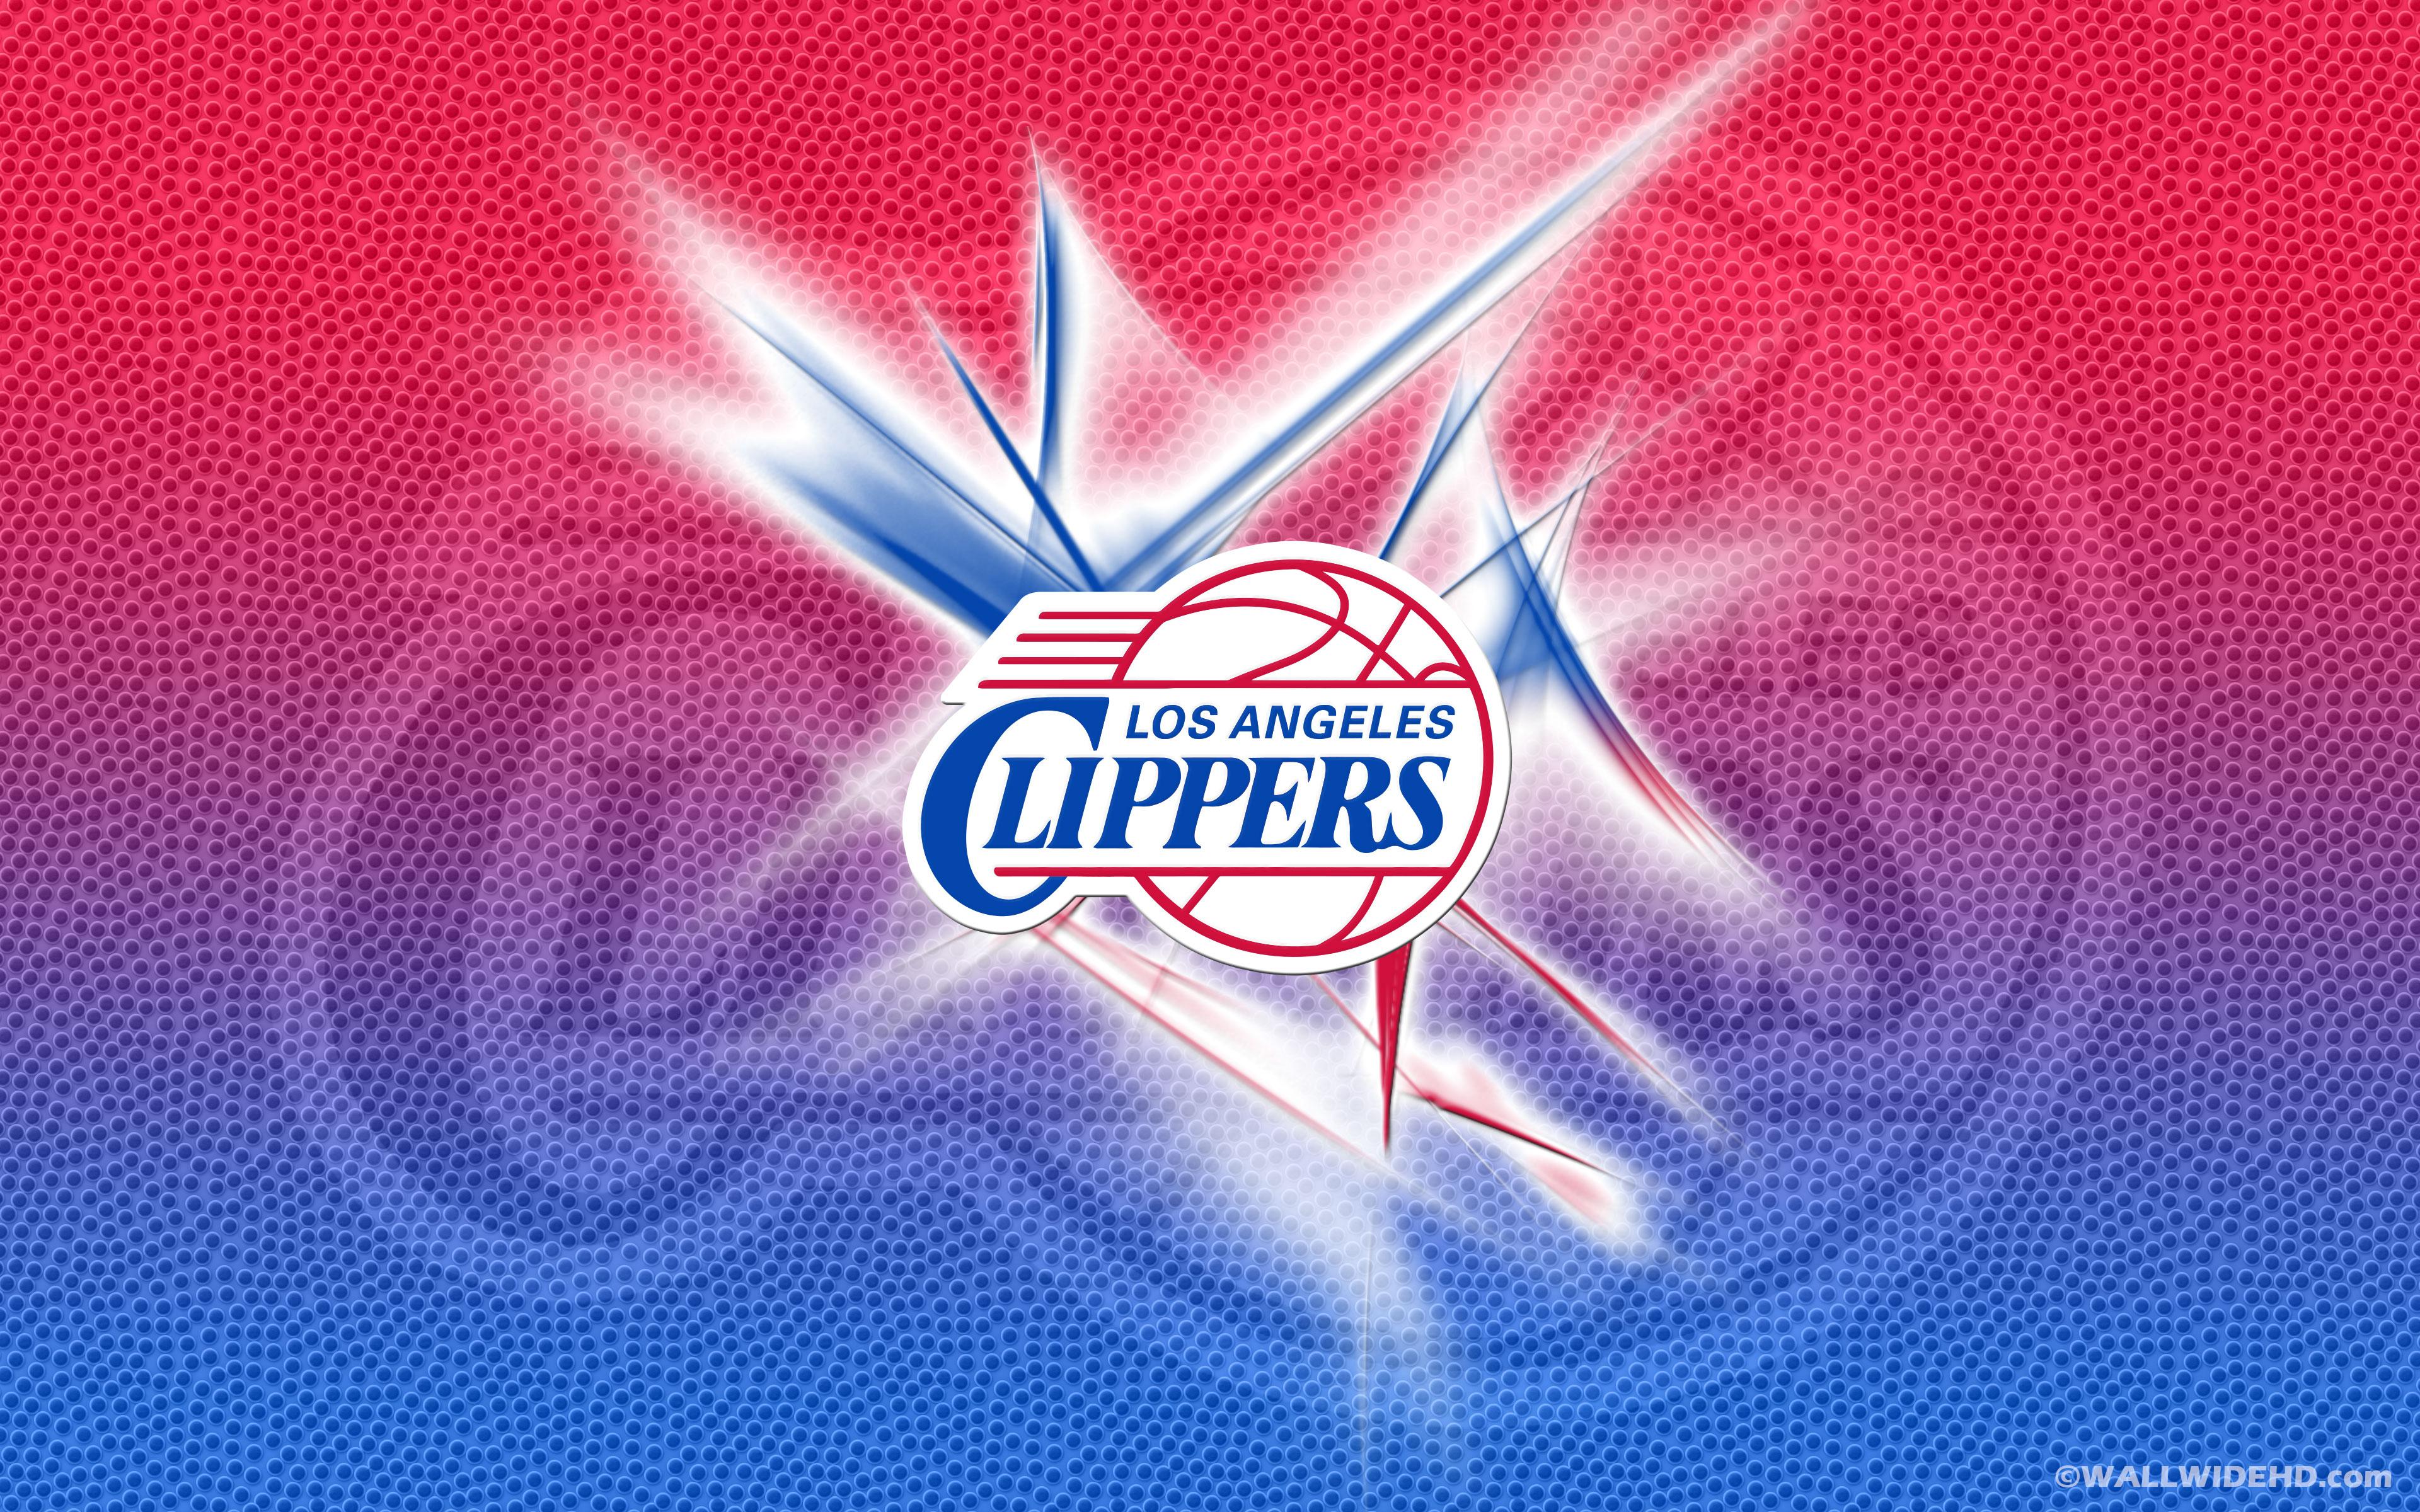 los angeles clippers wallpapers - wallpaper desktop hd •